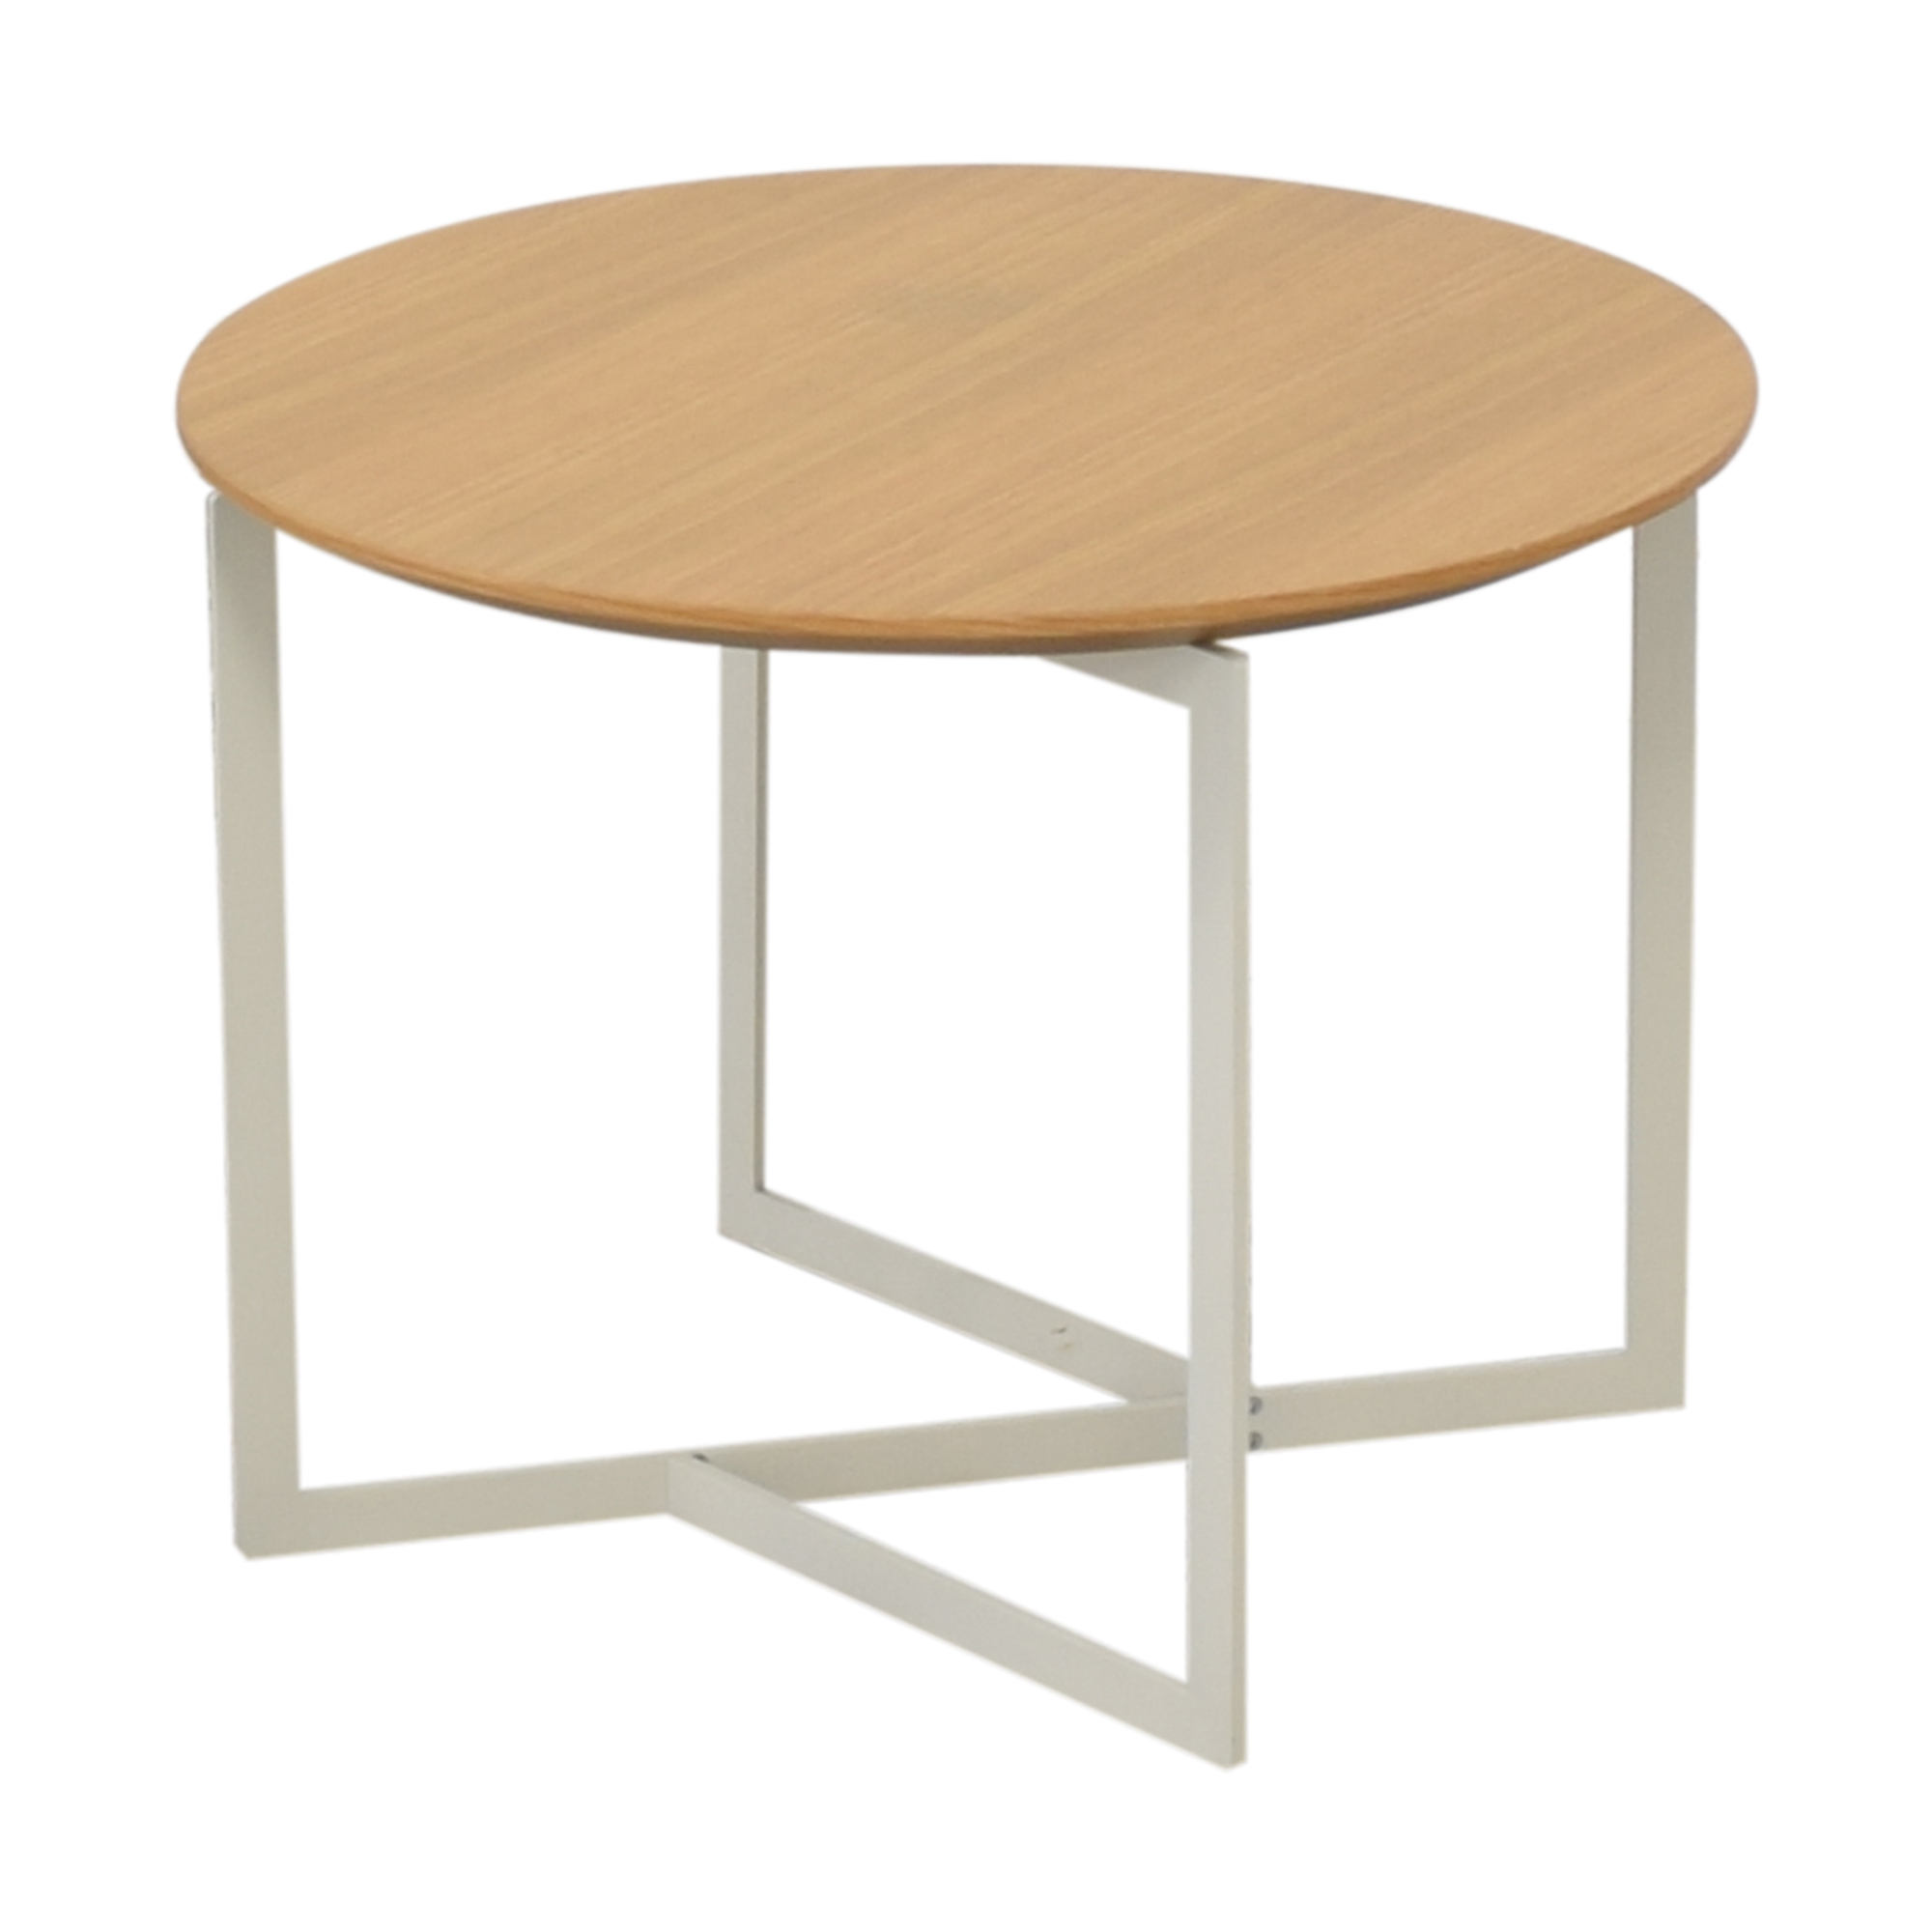 Koleksiyon Koleksiyon Terna Dining Table price